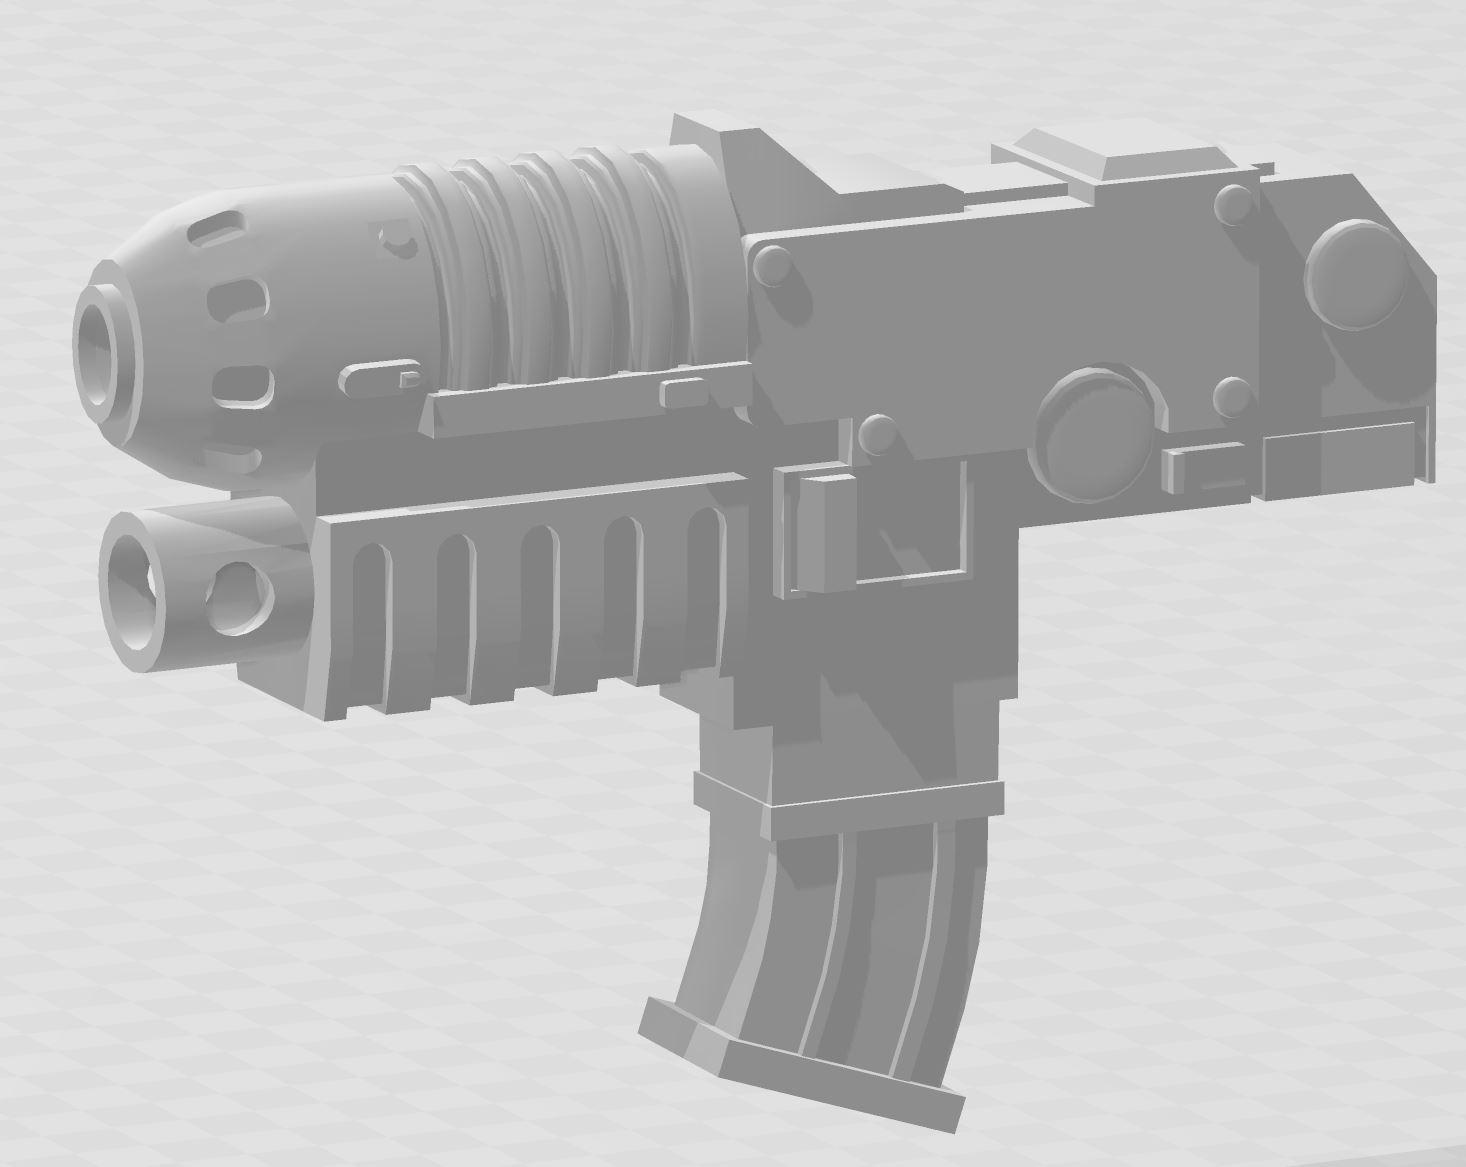 CombiPlas.JPG Download STL file Combi Plasma • 3D printable design, MKojiro